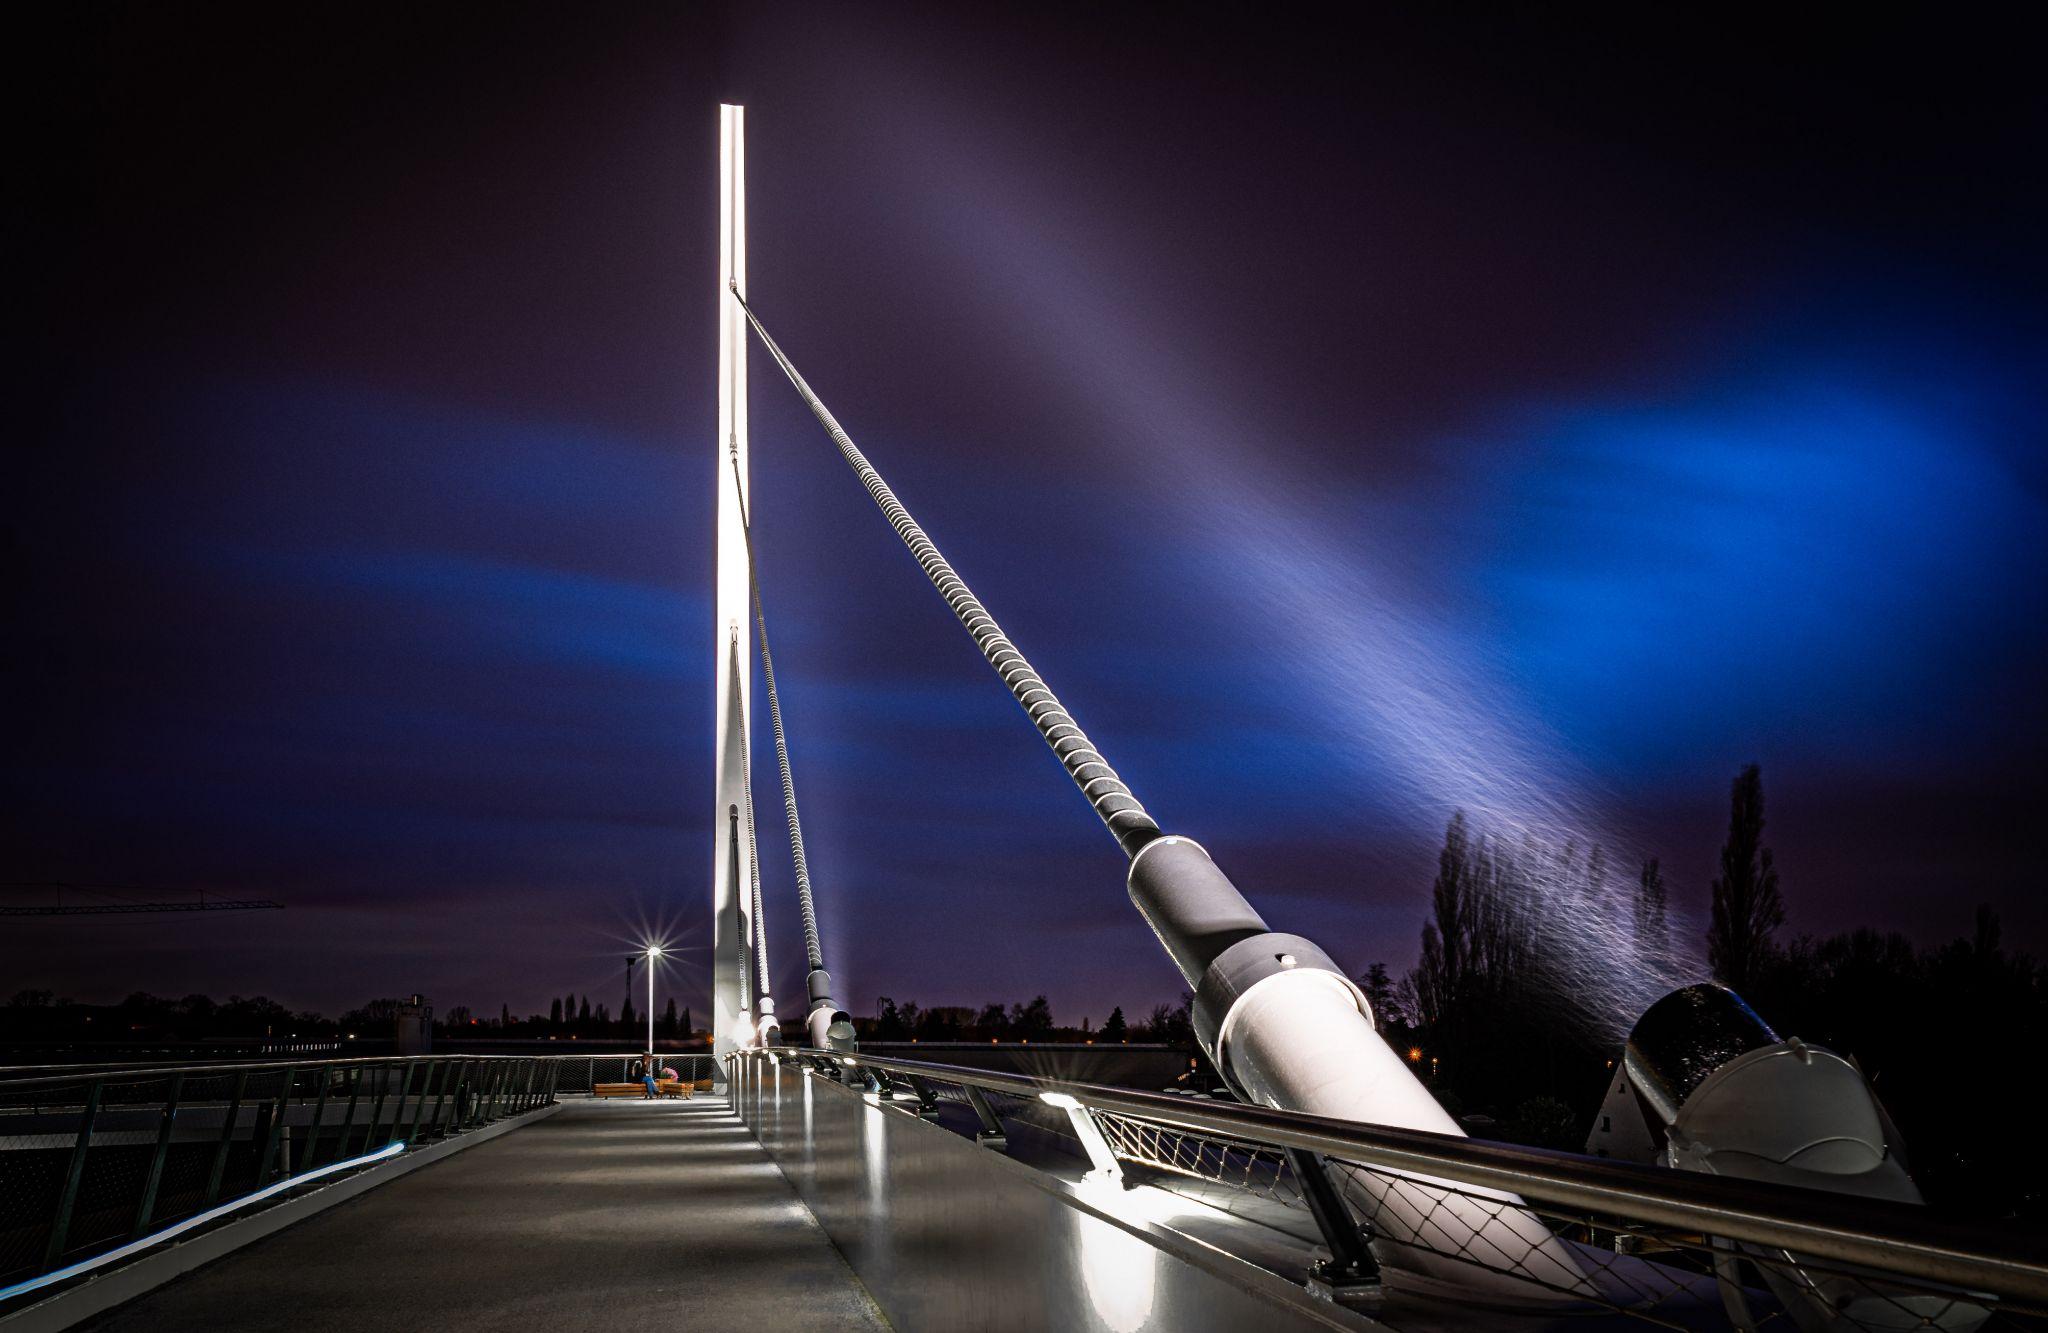 Voetgangersbrug, Belgium